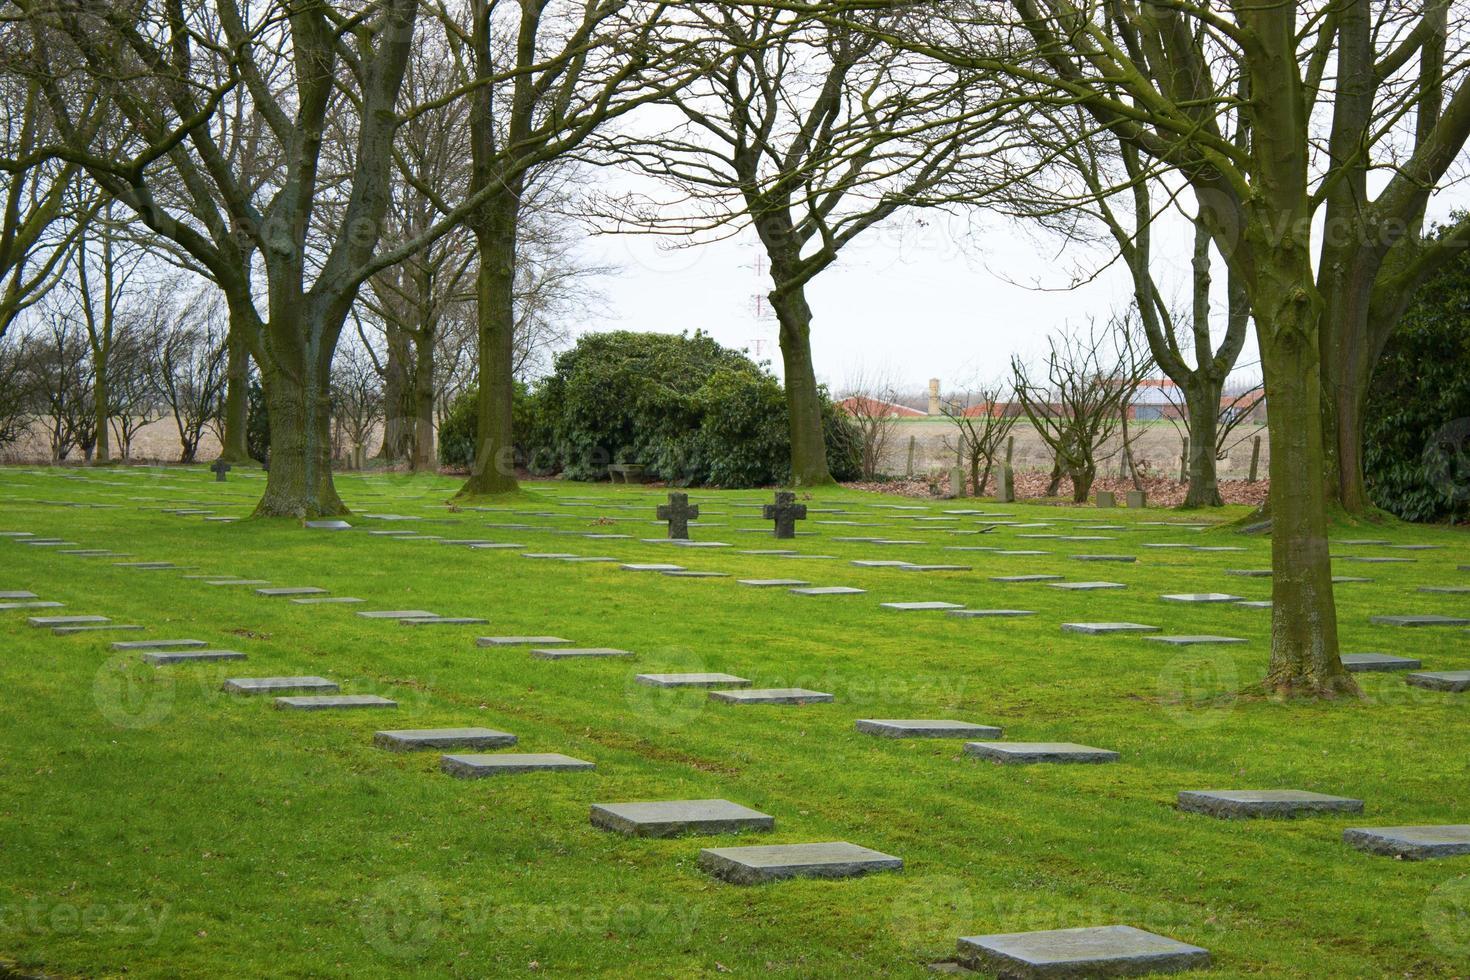 Deutscher Großer Weltkrieg 1 Flandern Felder Belgien Friedhof foto